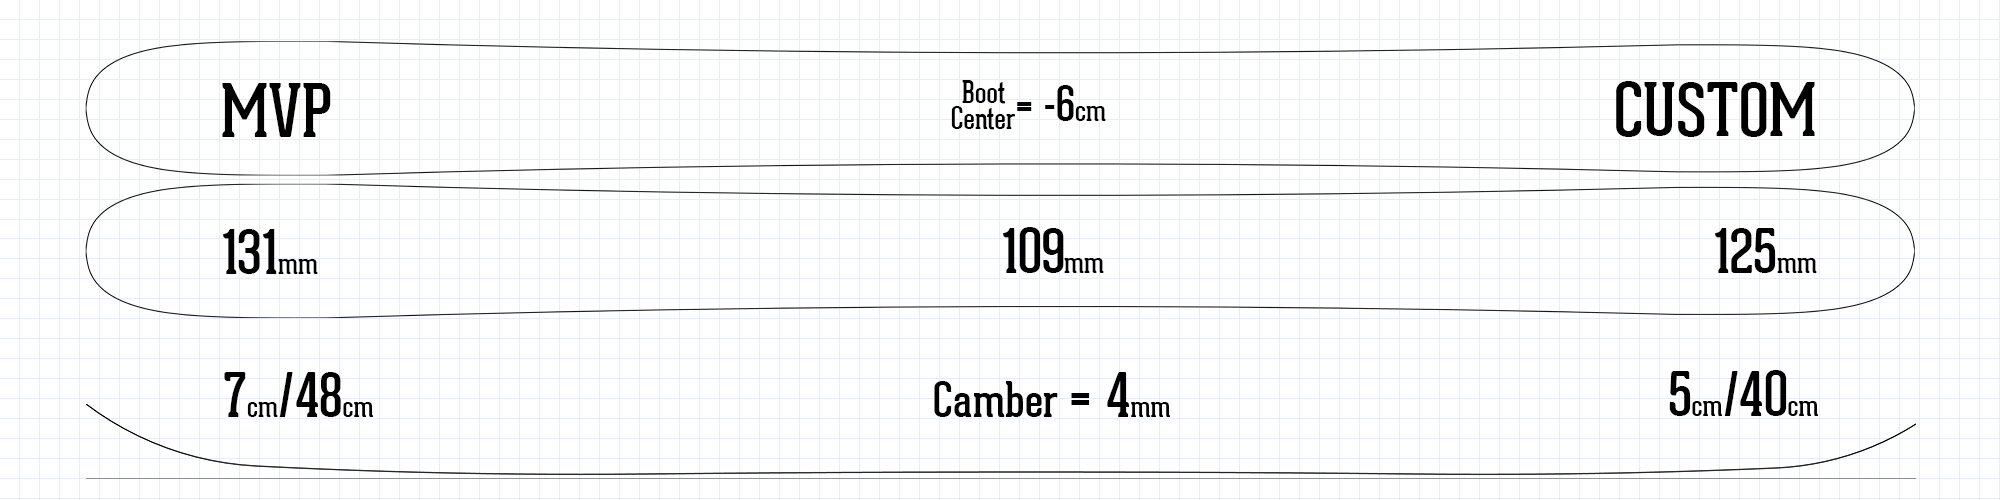 MVP ski information spec sheet rocker camber profile